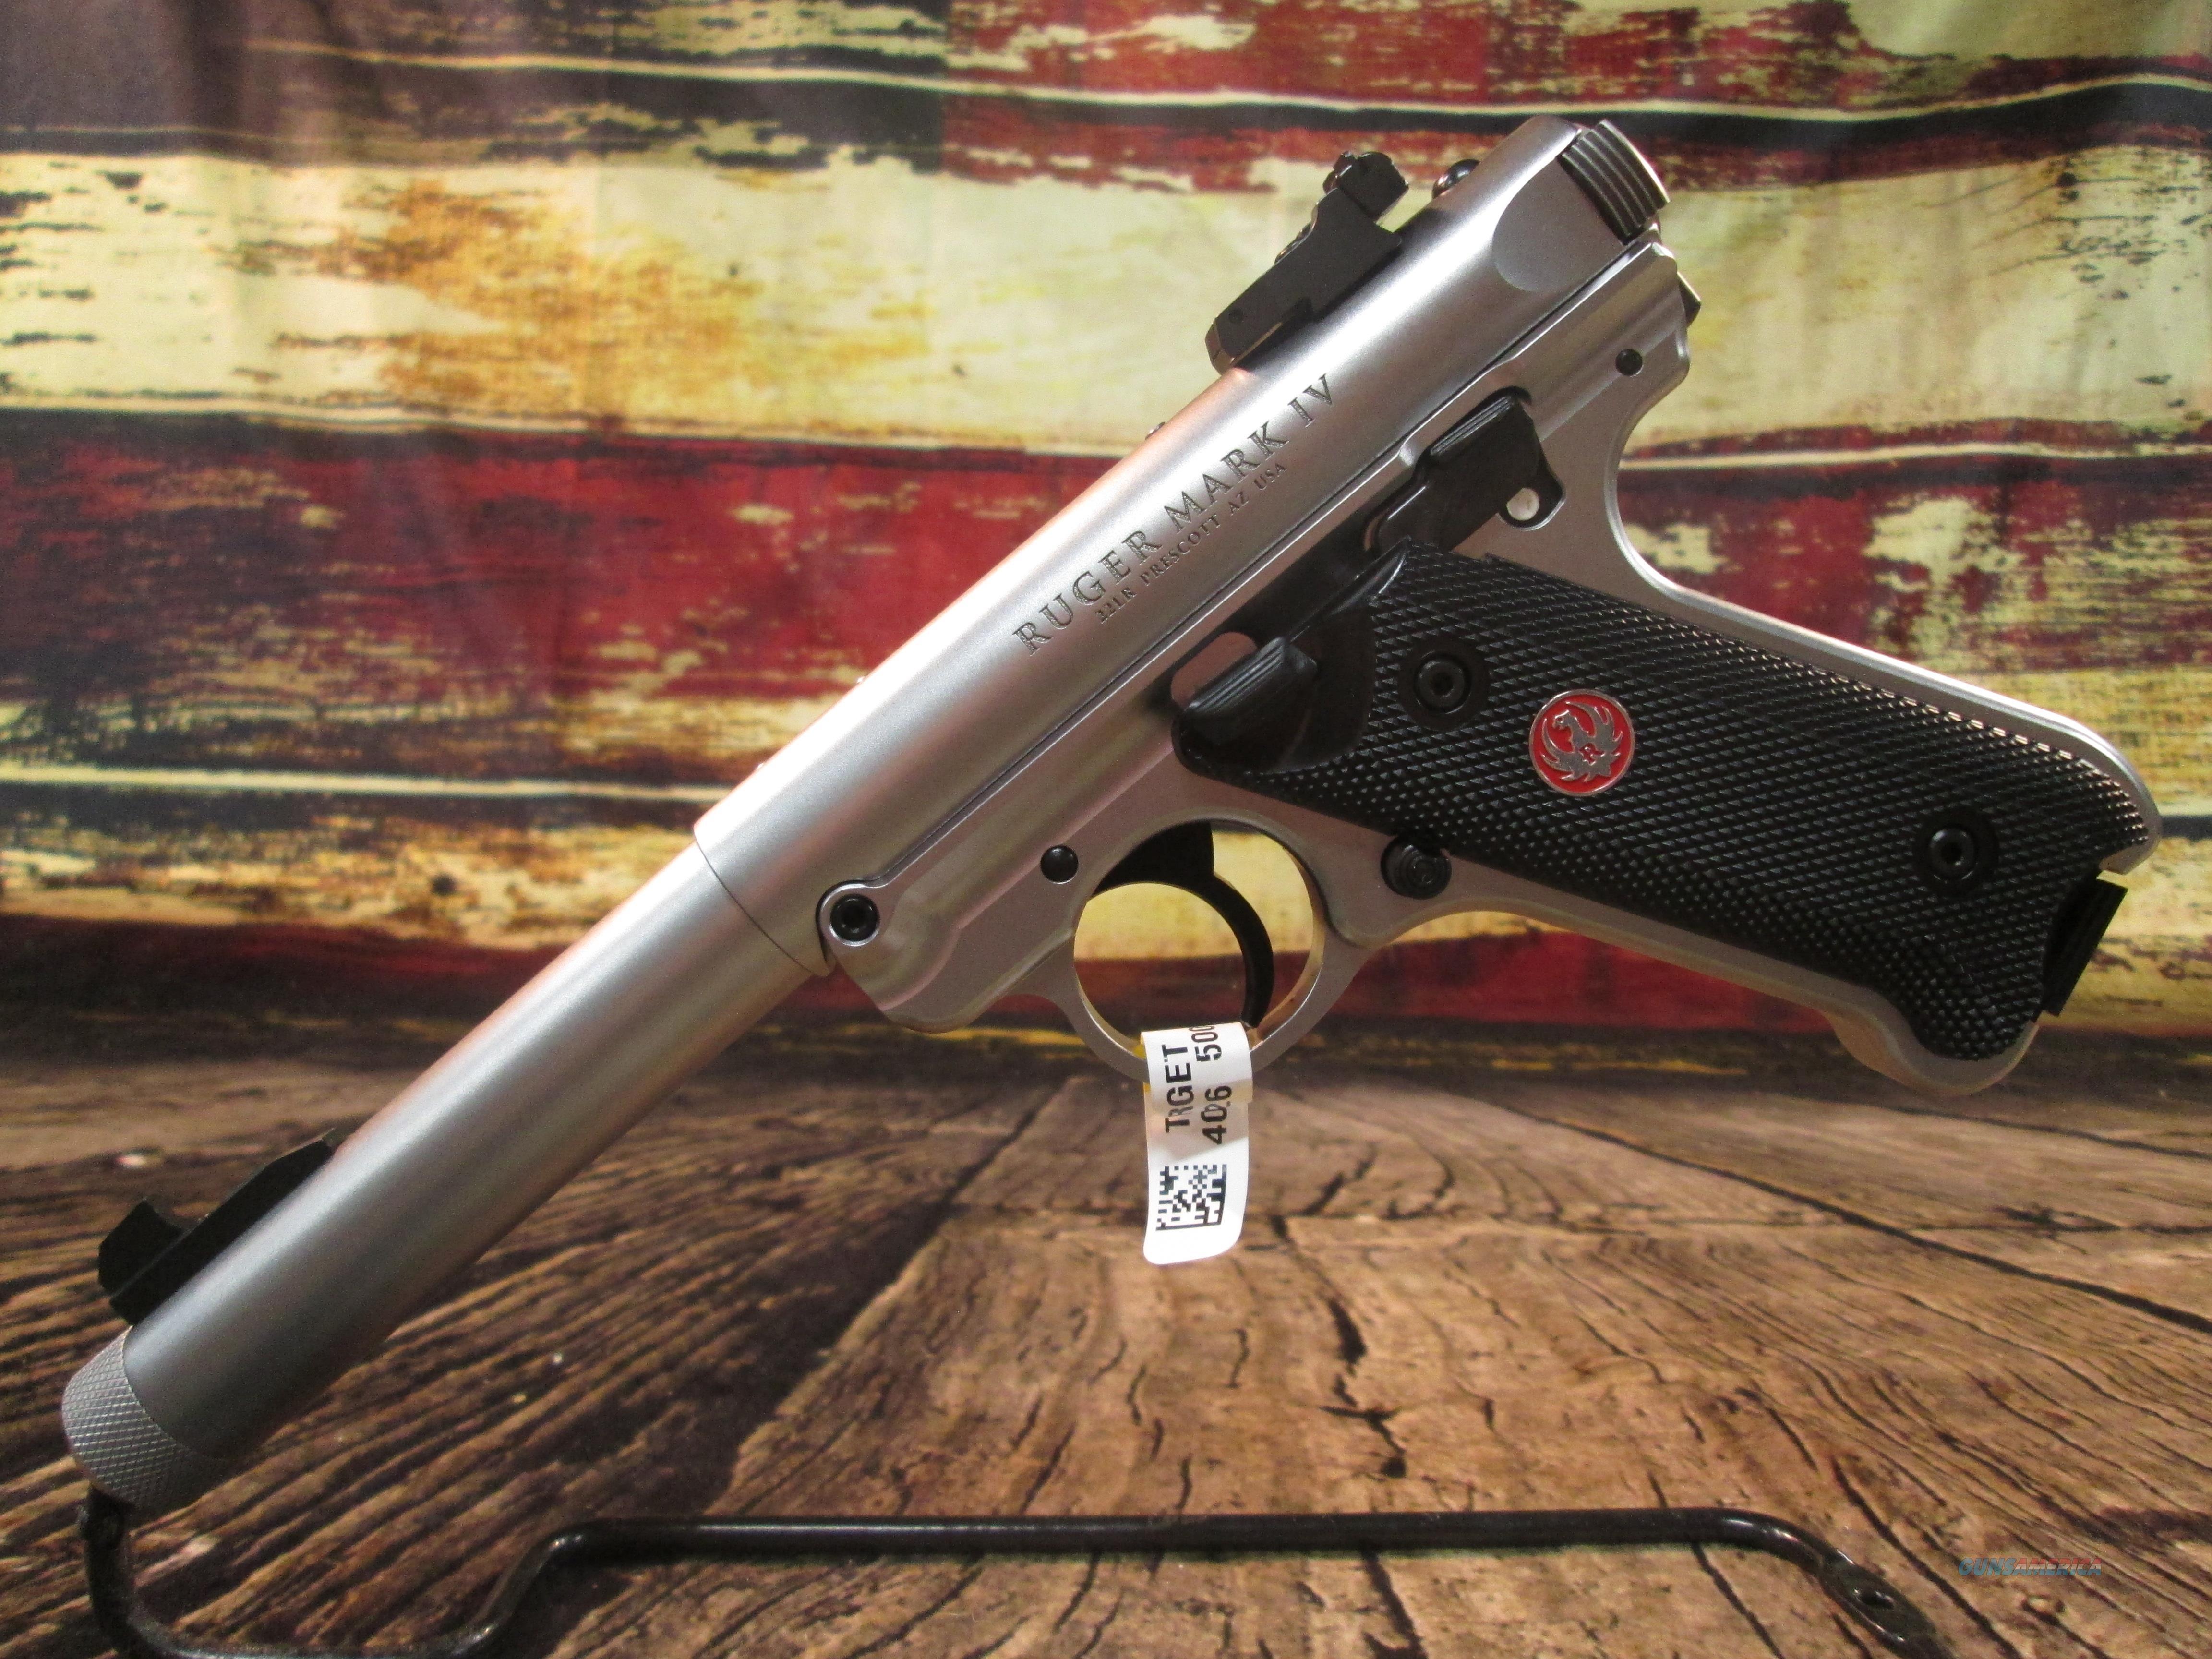 "RUGER MKIV TARGET 5.5"" STAINLESS 22LR (40126)  Guns > Pistols > Ruger Semi-Auto Pistols > Mark I/II/III/IV Family"